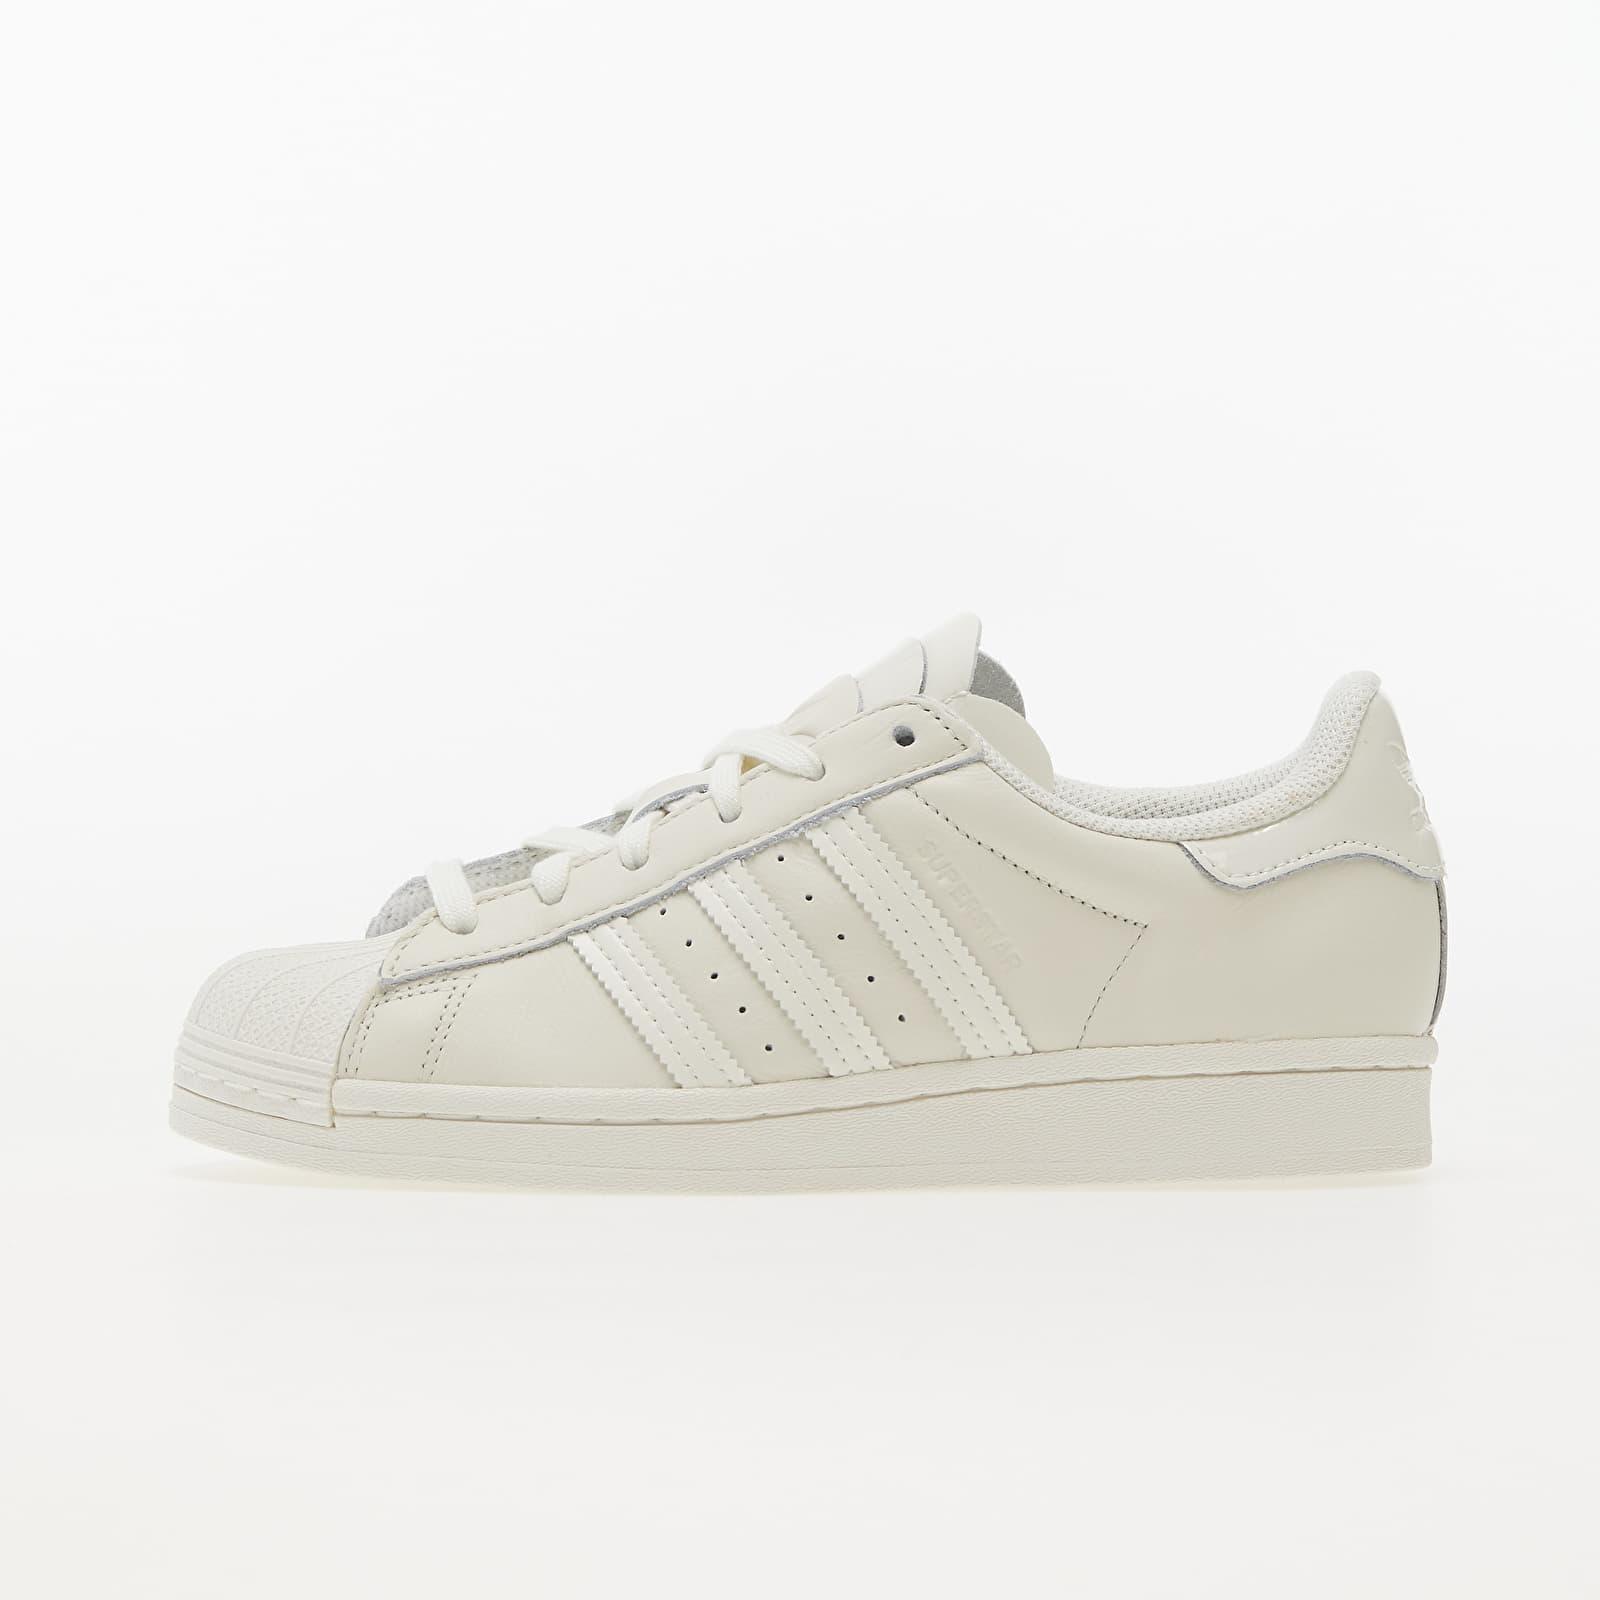 adidas Superstar W Off White/ Off White/ Core Black EUR 40